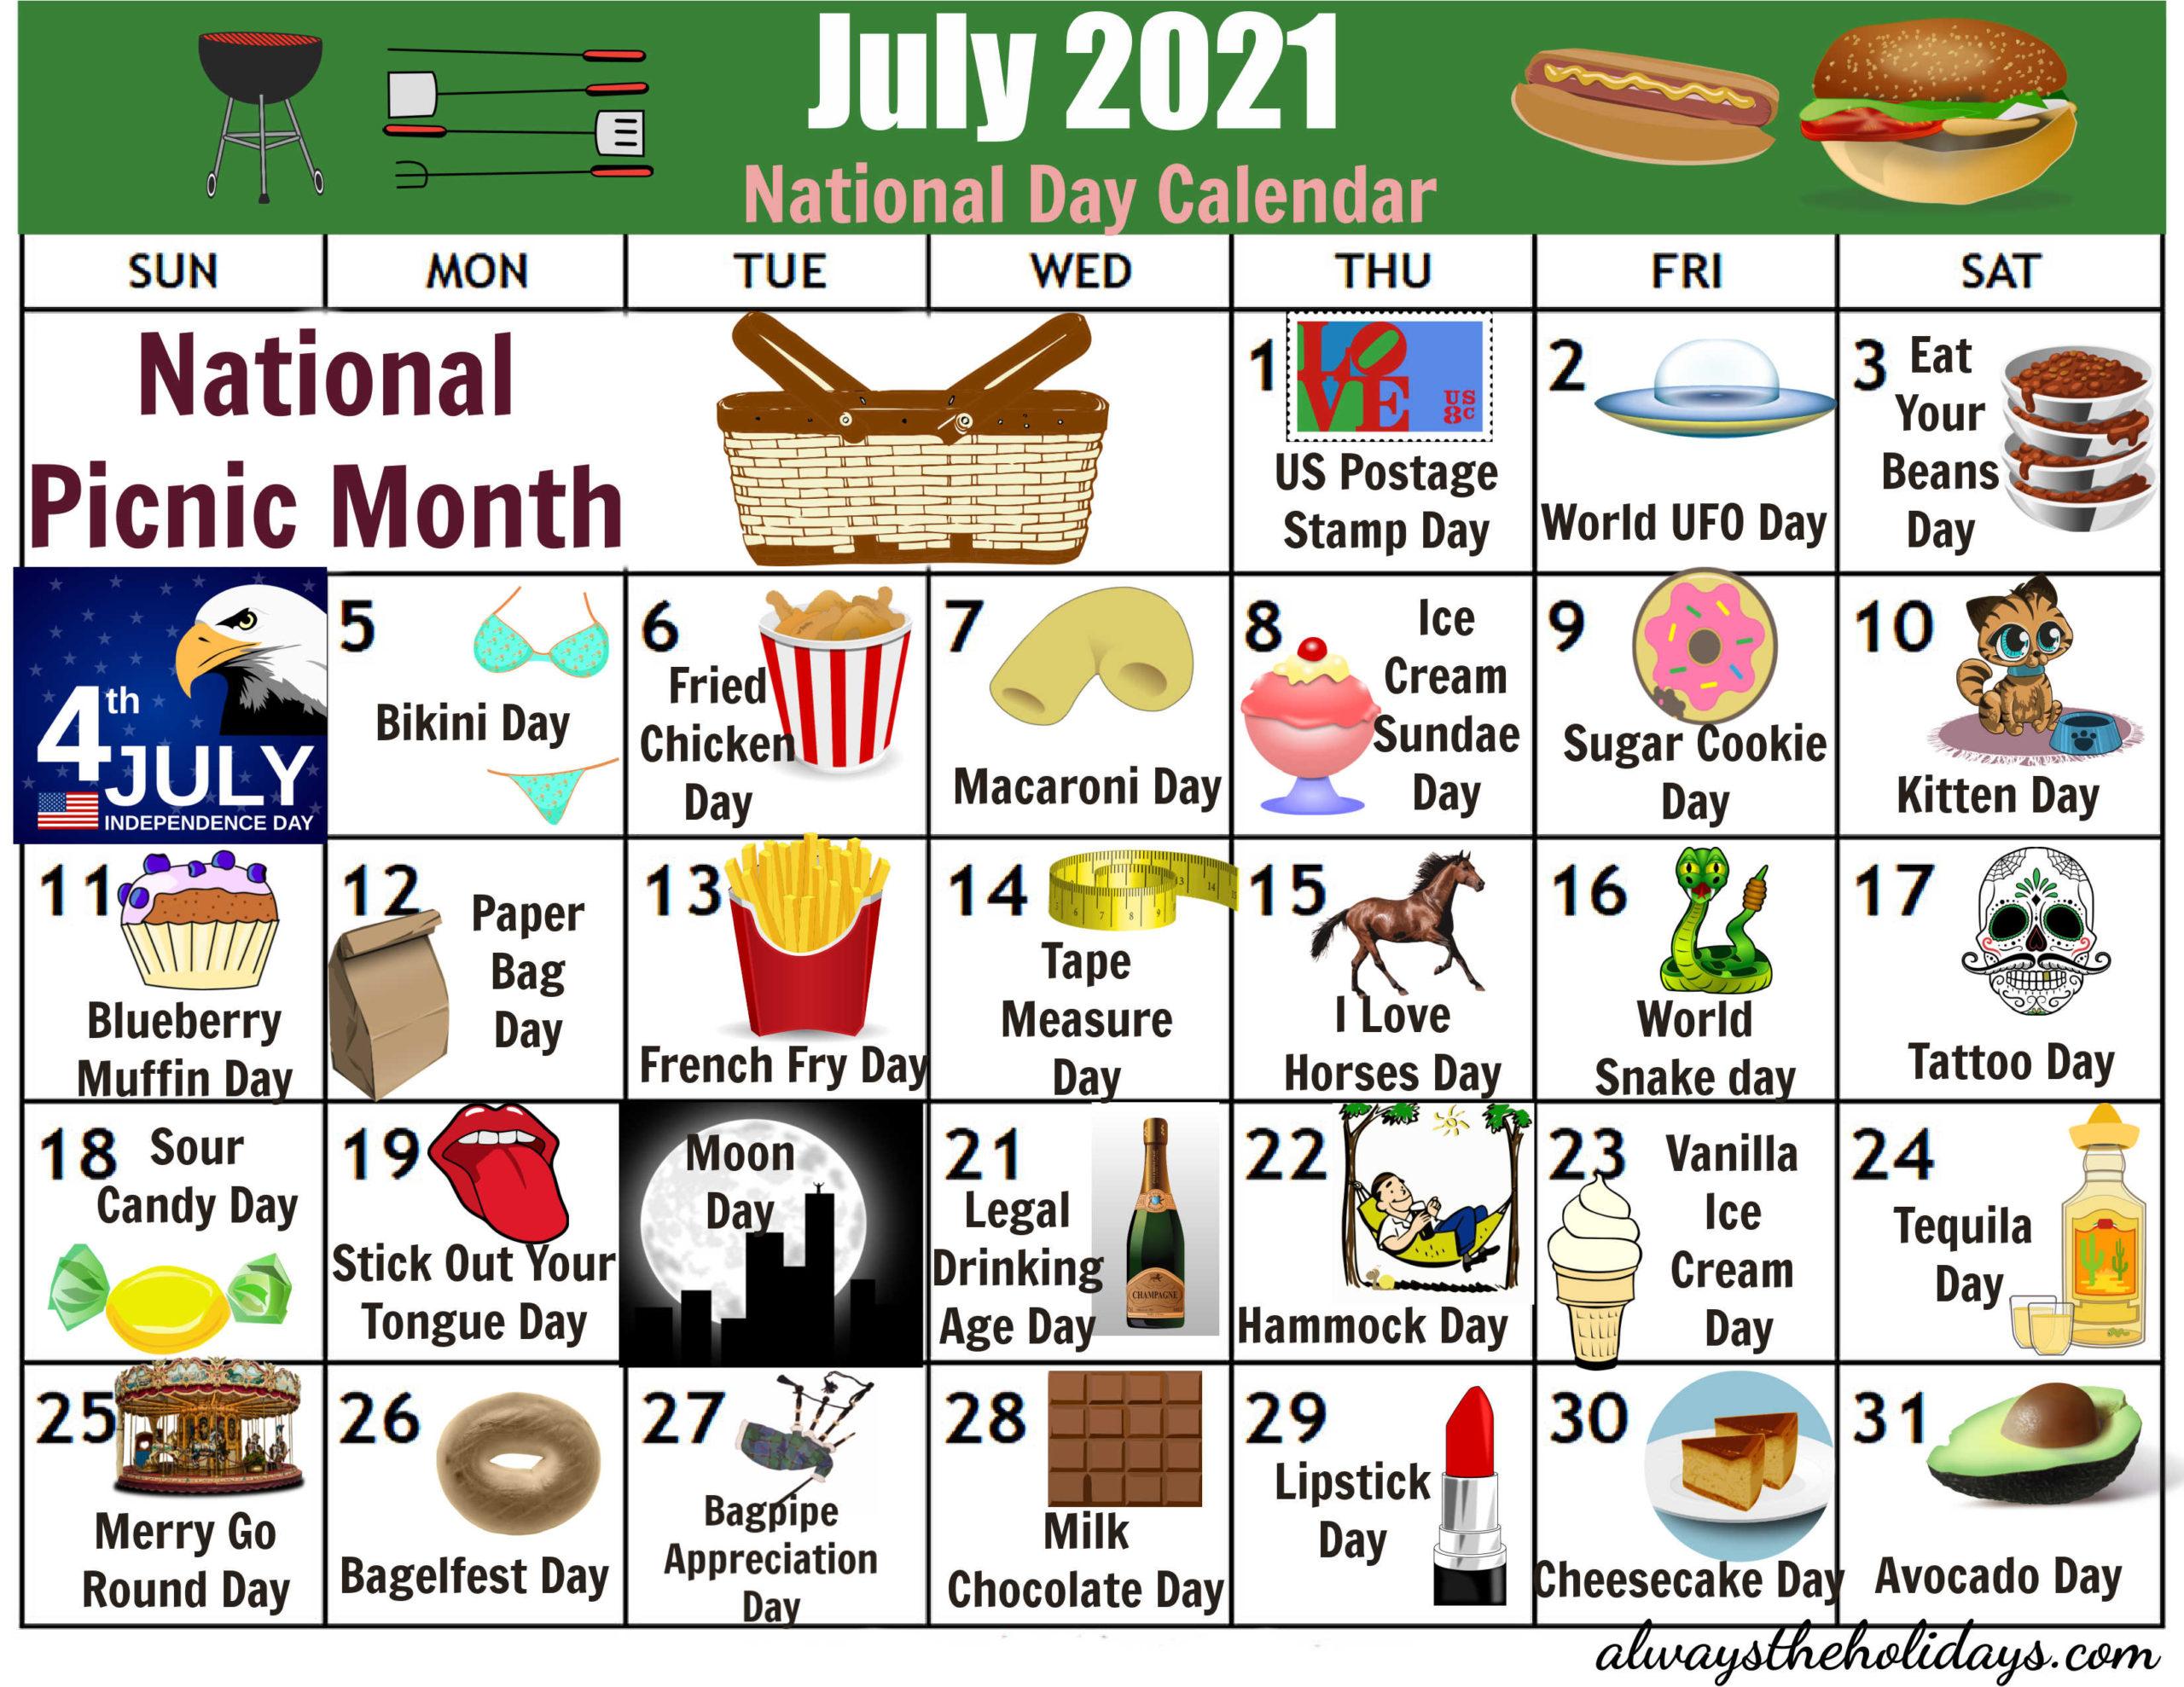 July National Day Calendar - Free Printable - 2021